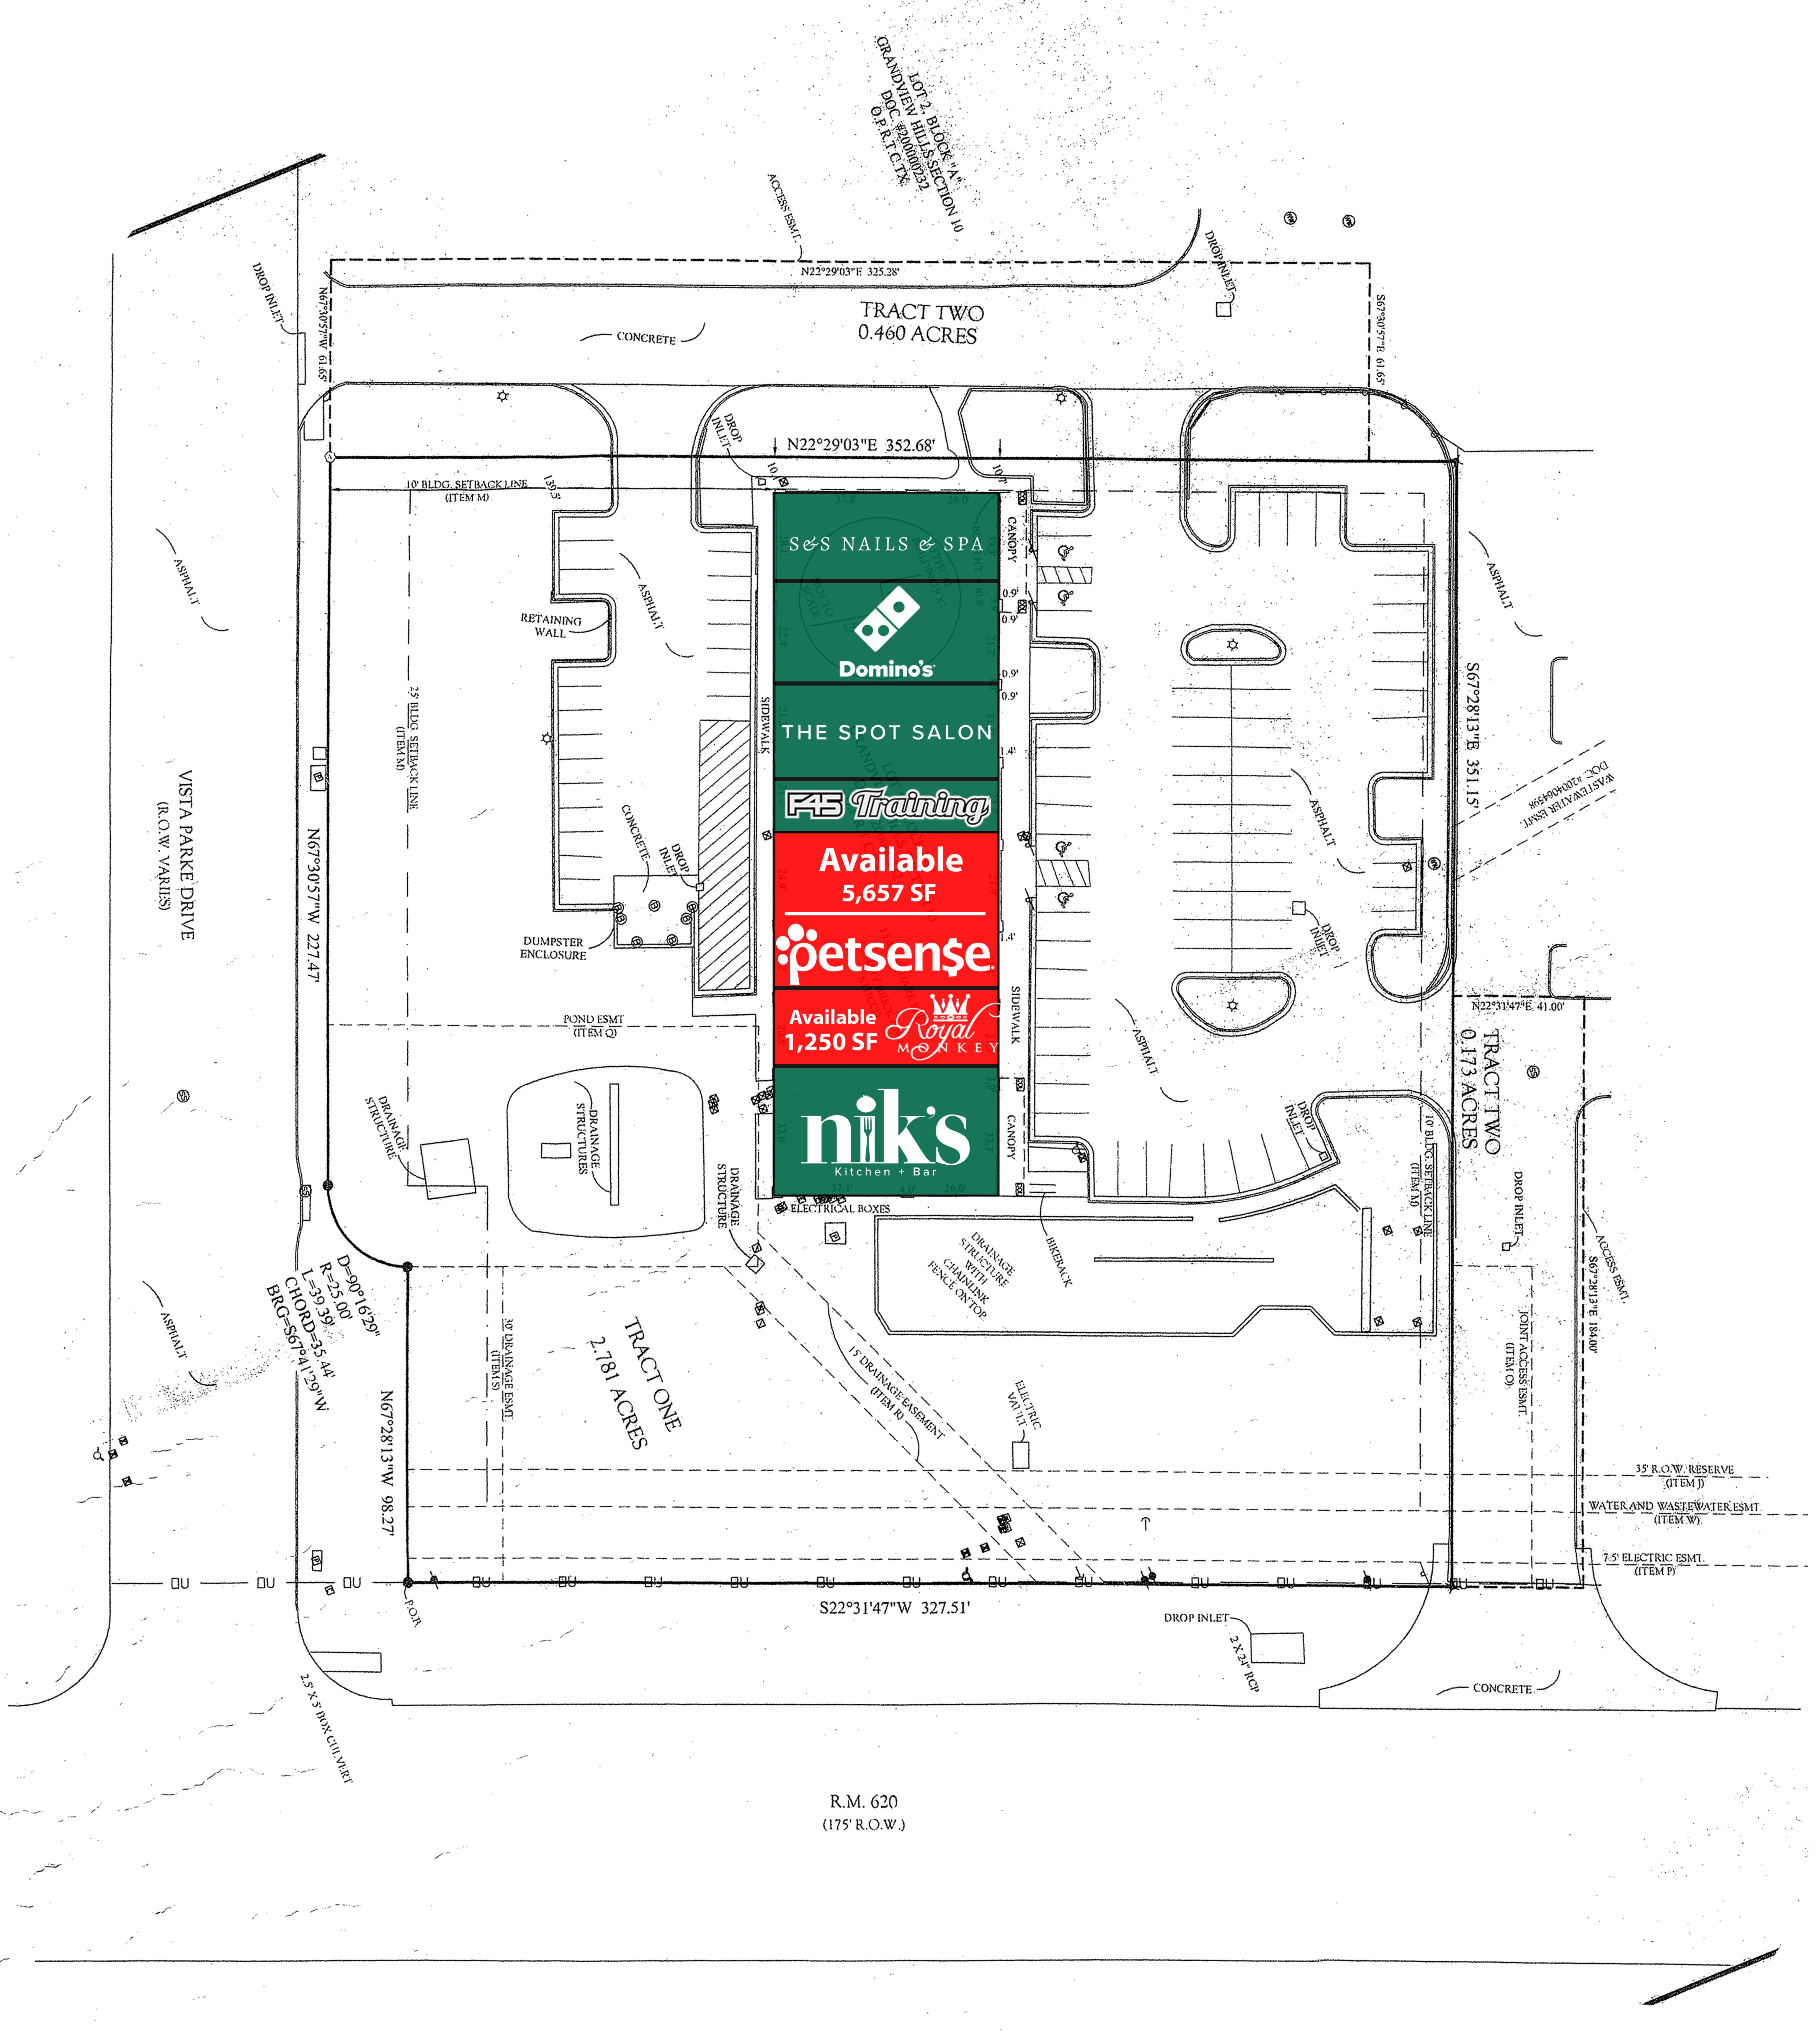 Grandview Shopping Center: site plan